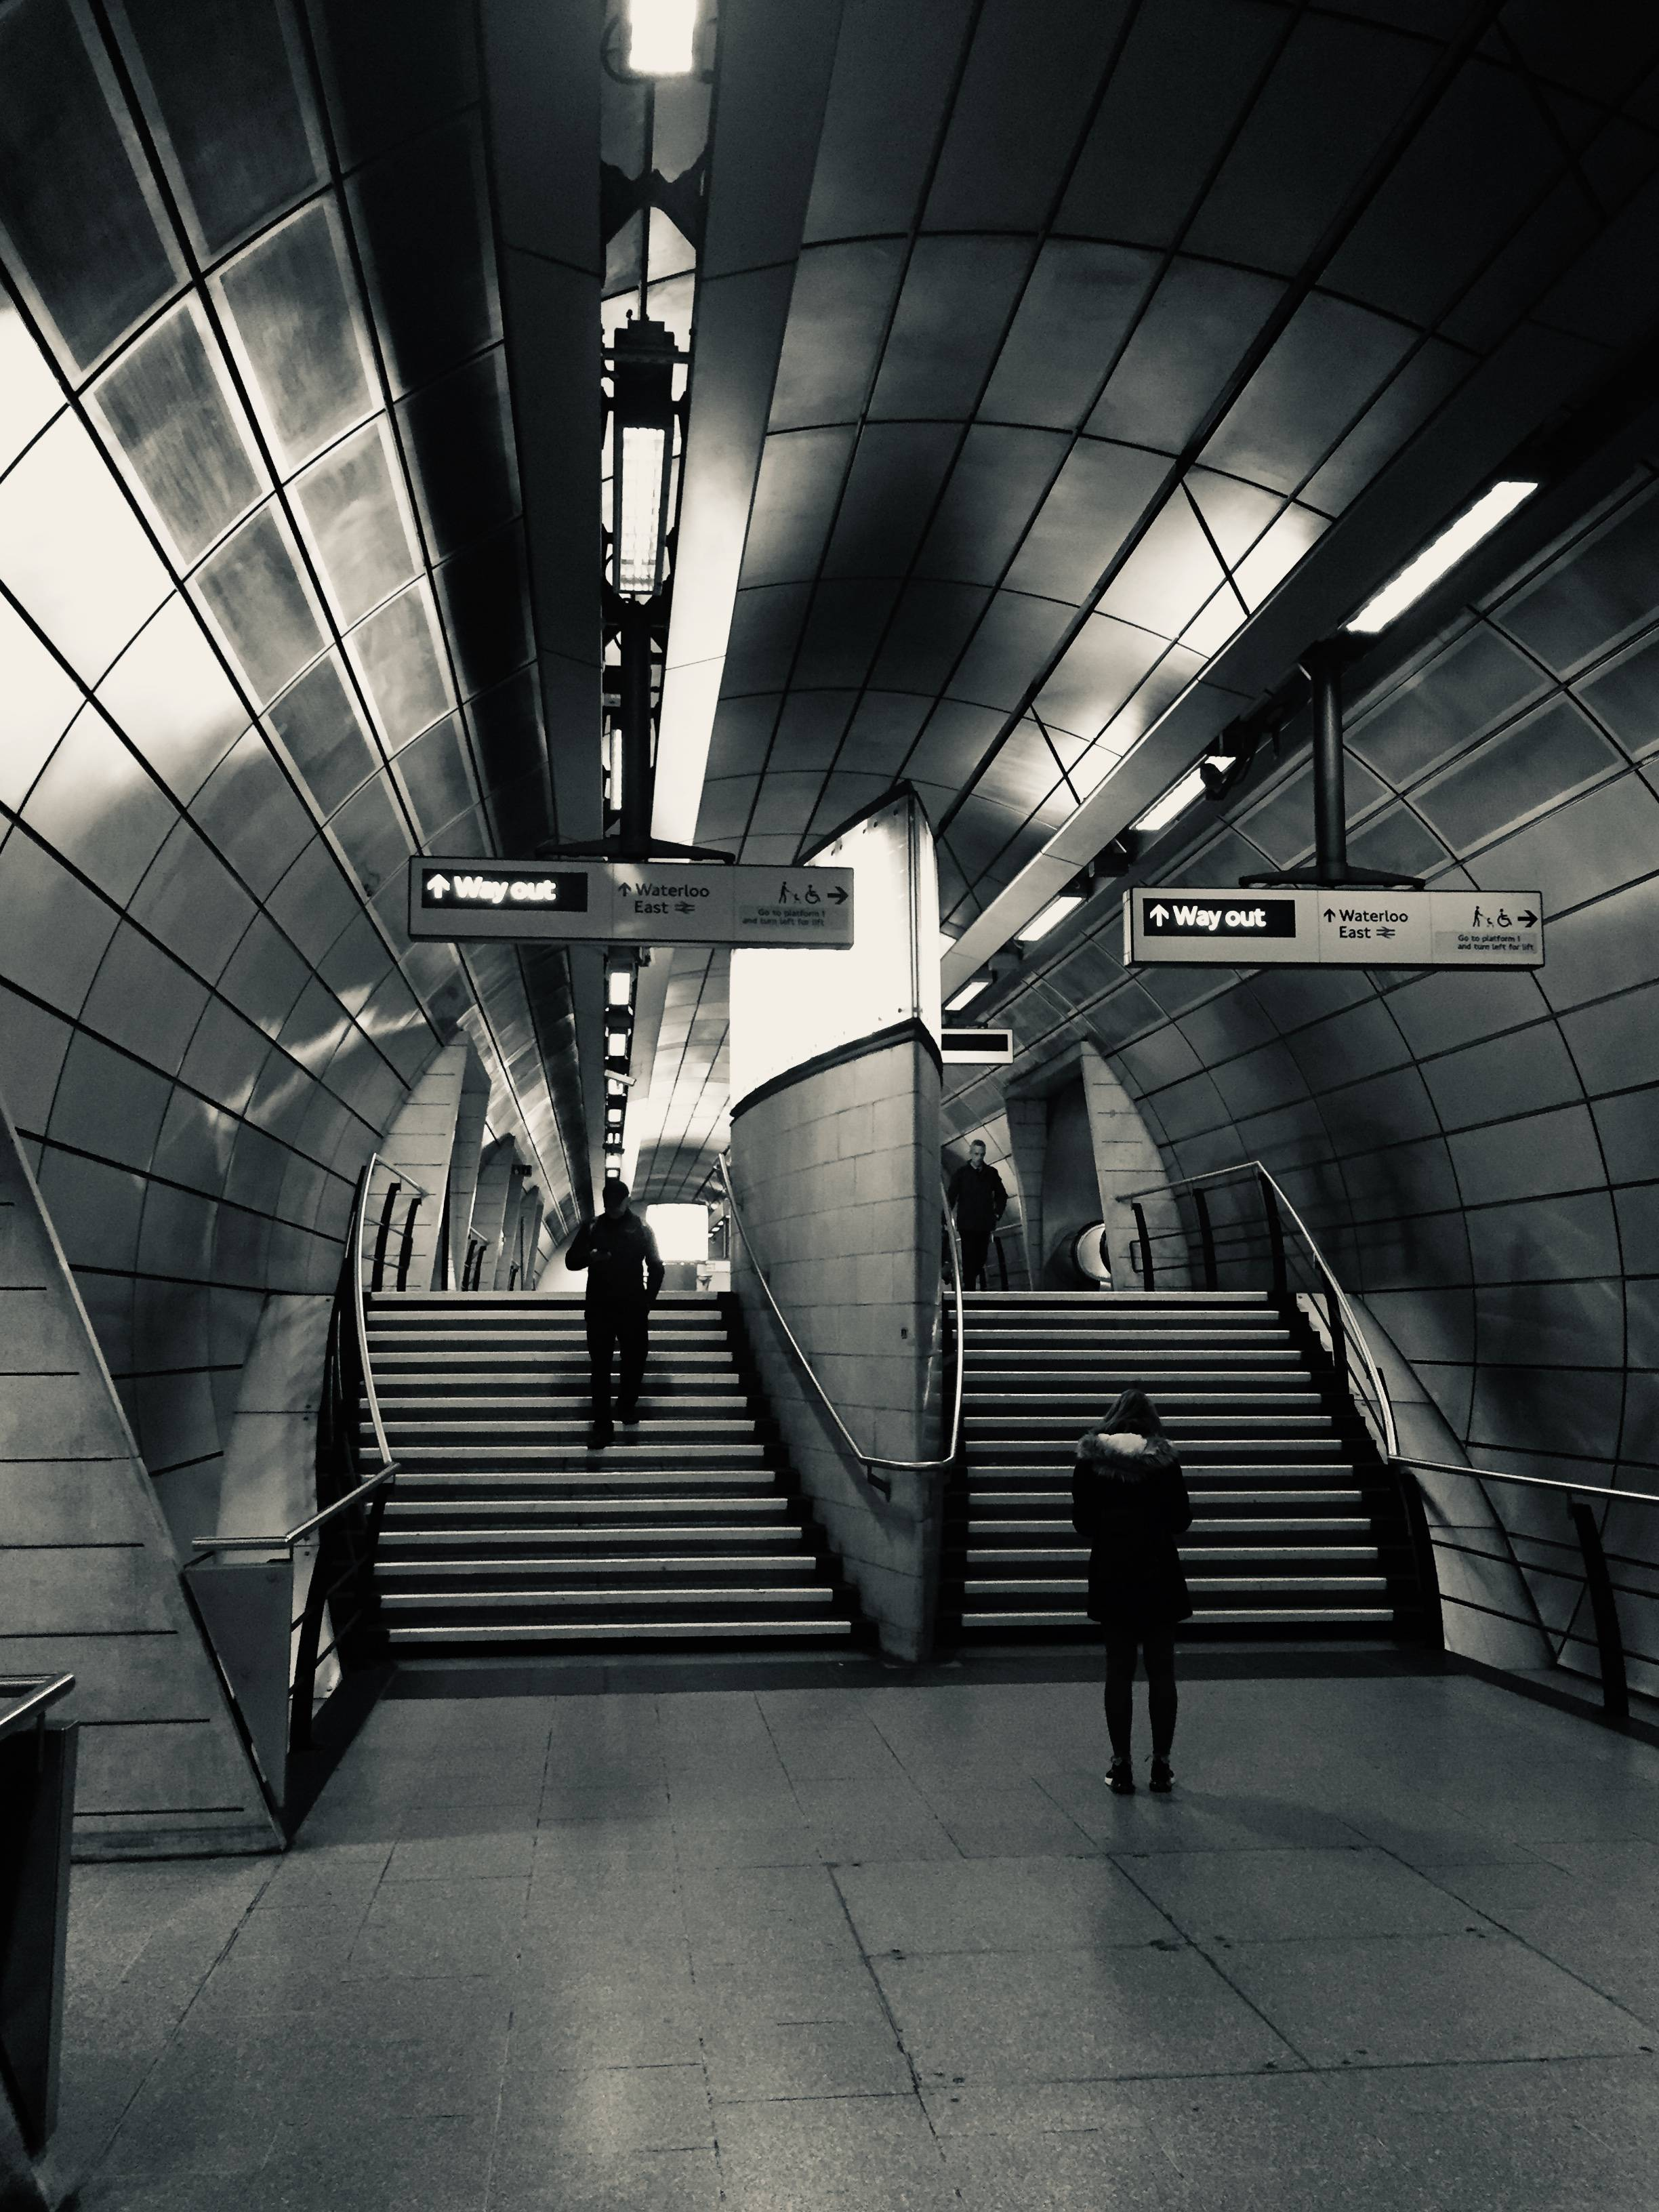 London B/W abstract photograph